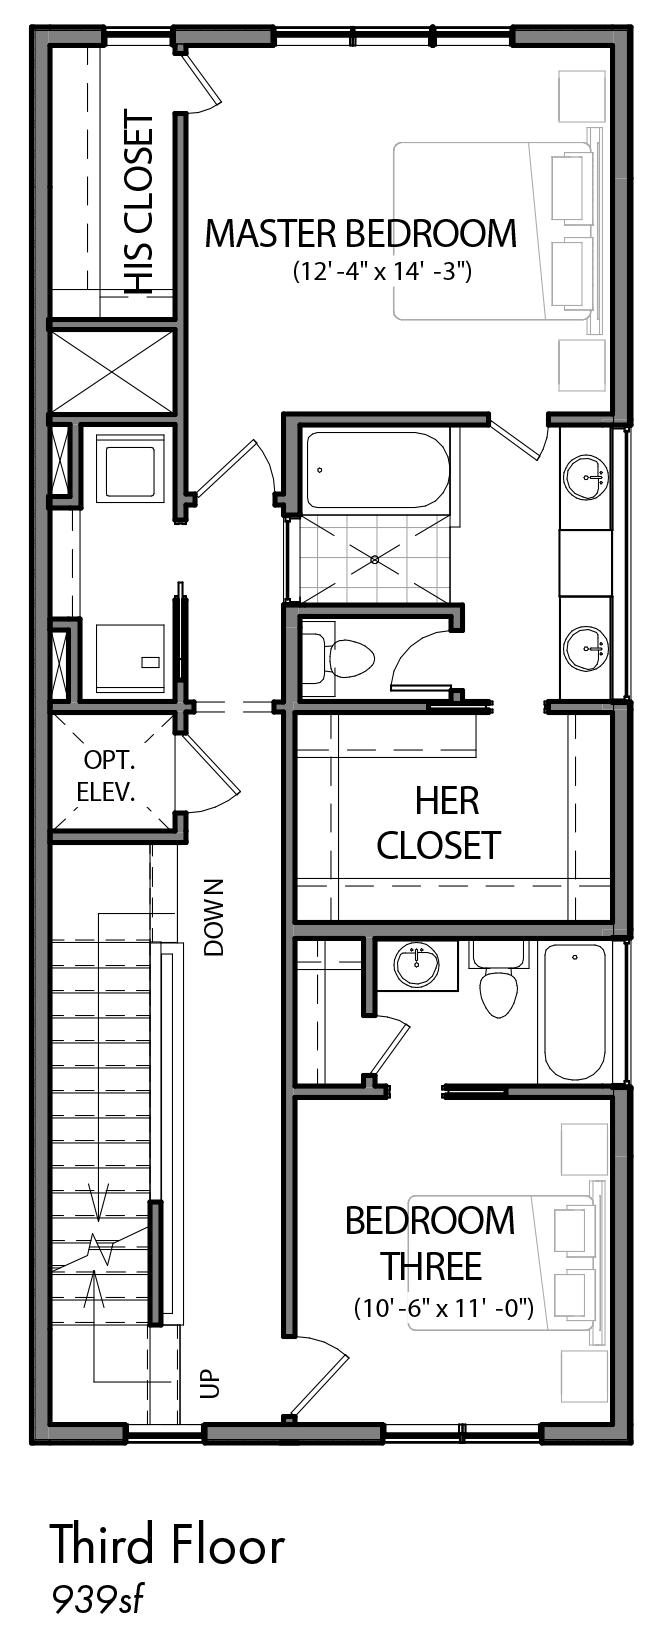 5855 east post oak lane urban lofts townhomes for Build on your lot houston floor plans